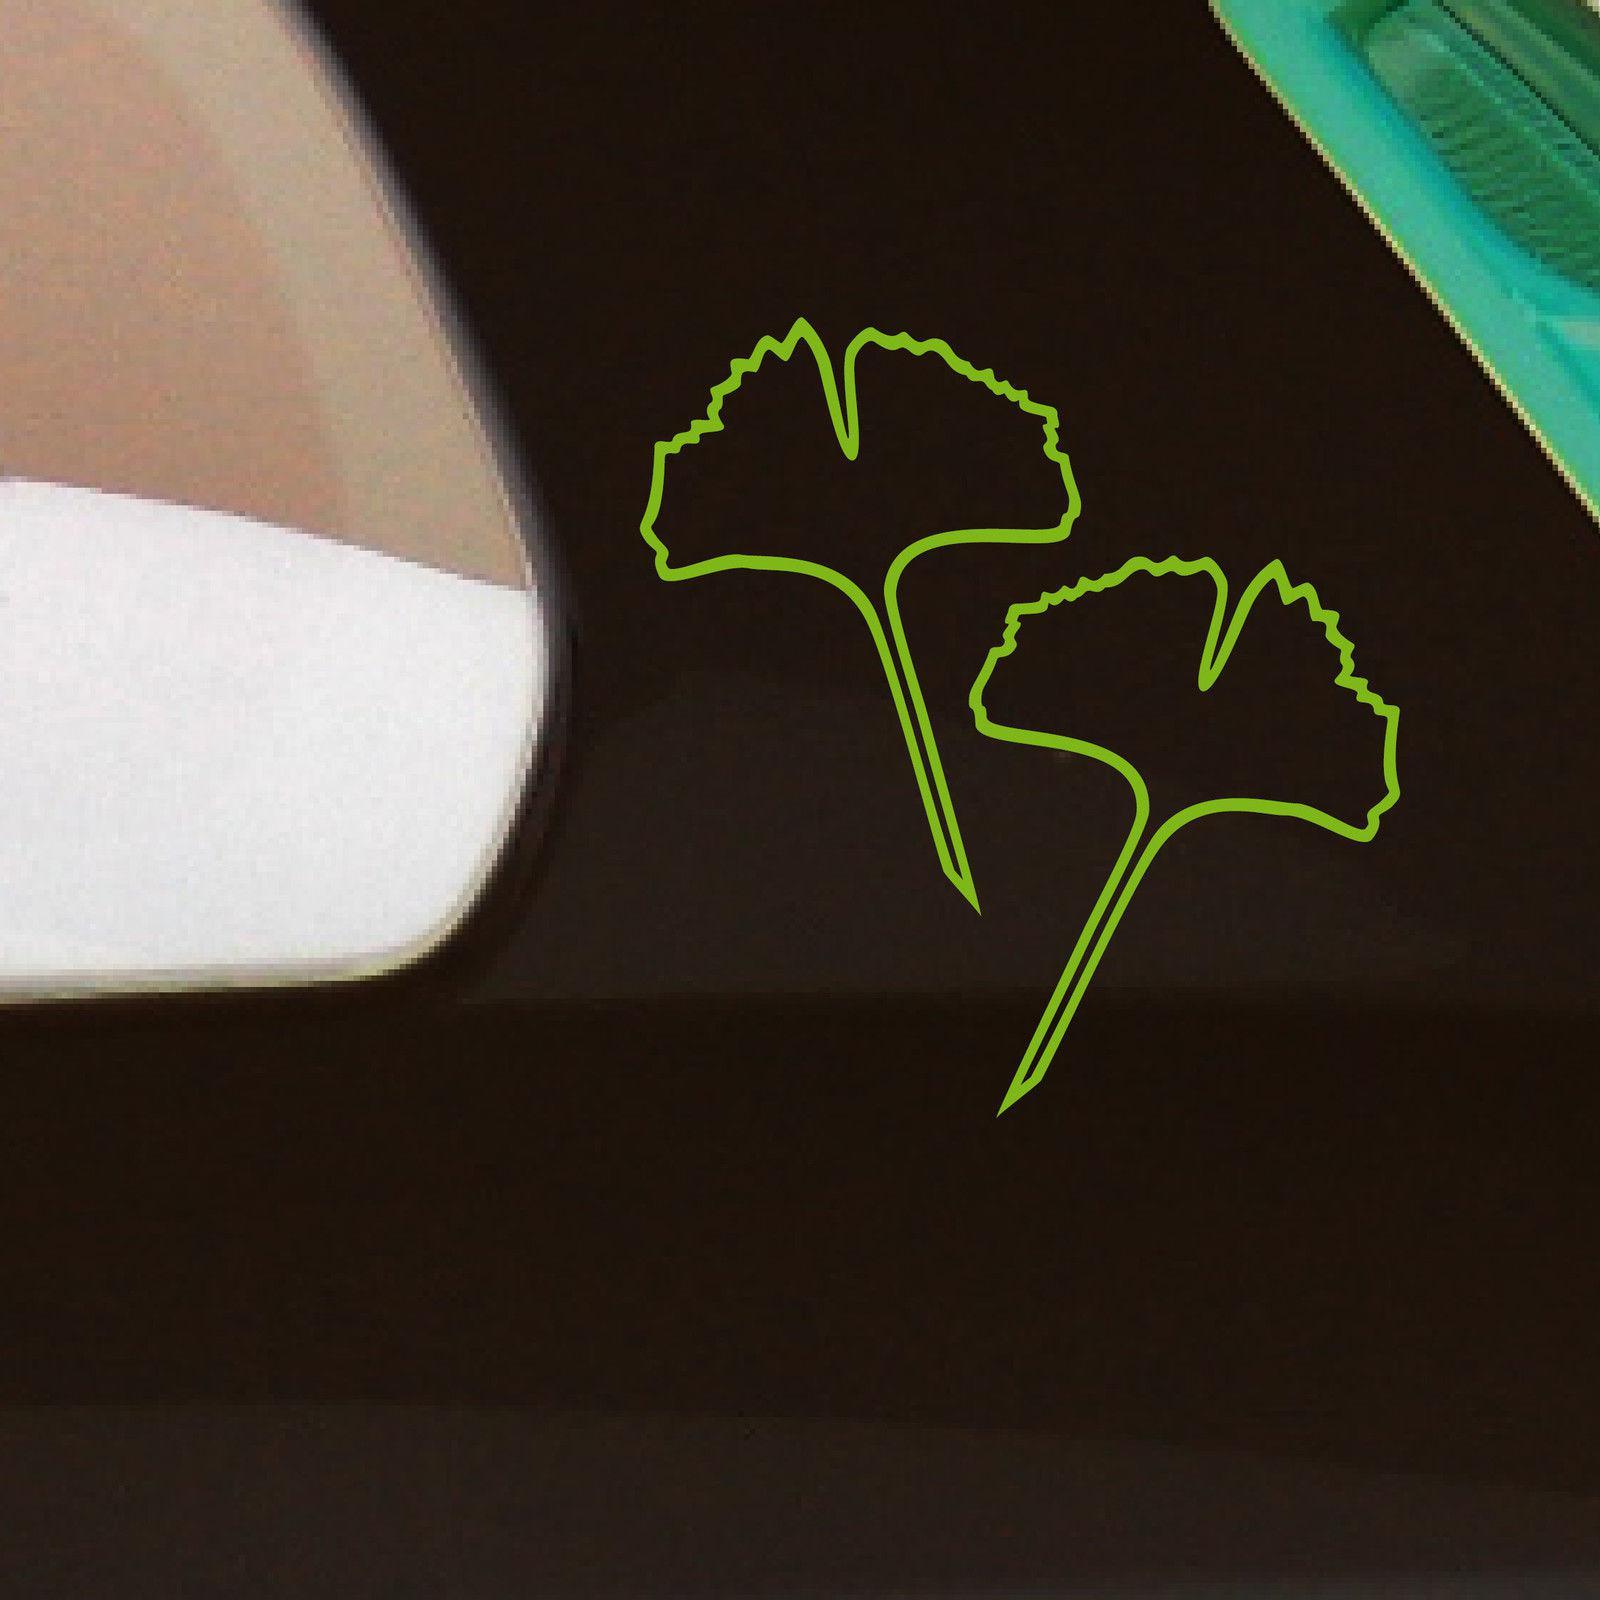 4 aufkleber 15cm gr n kontur gingko ginko blatt bl tter auto tattoo deko folie kaufen bei green it. Black Bedroom Furniture Sets. Home Design Ideas